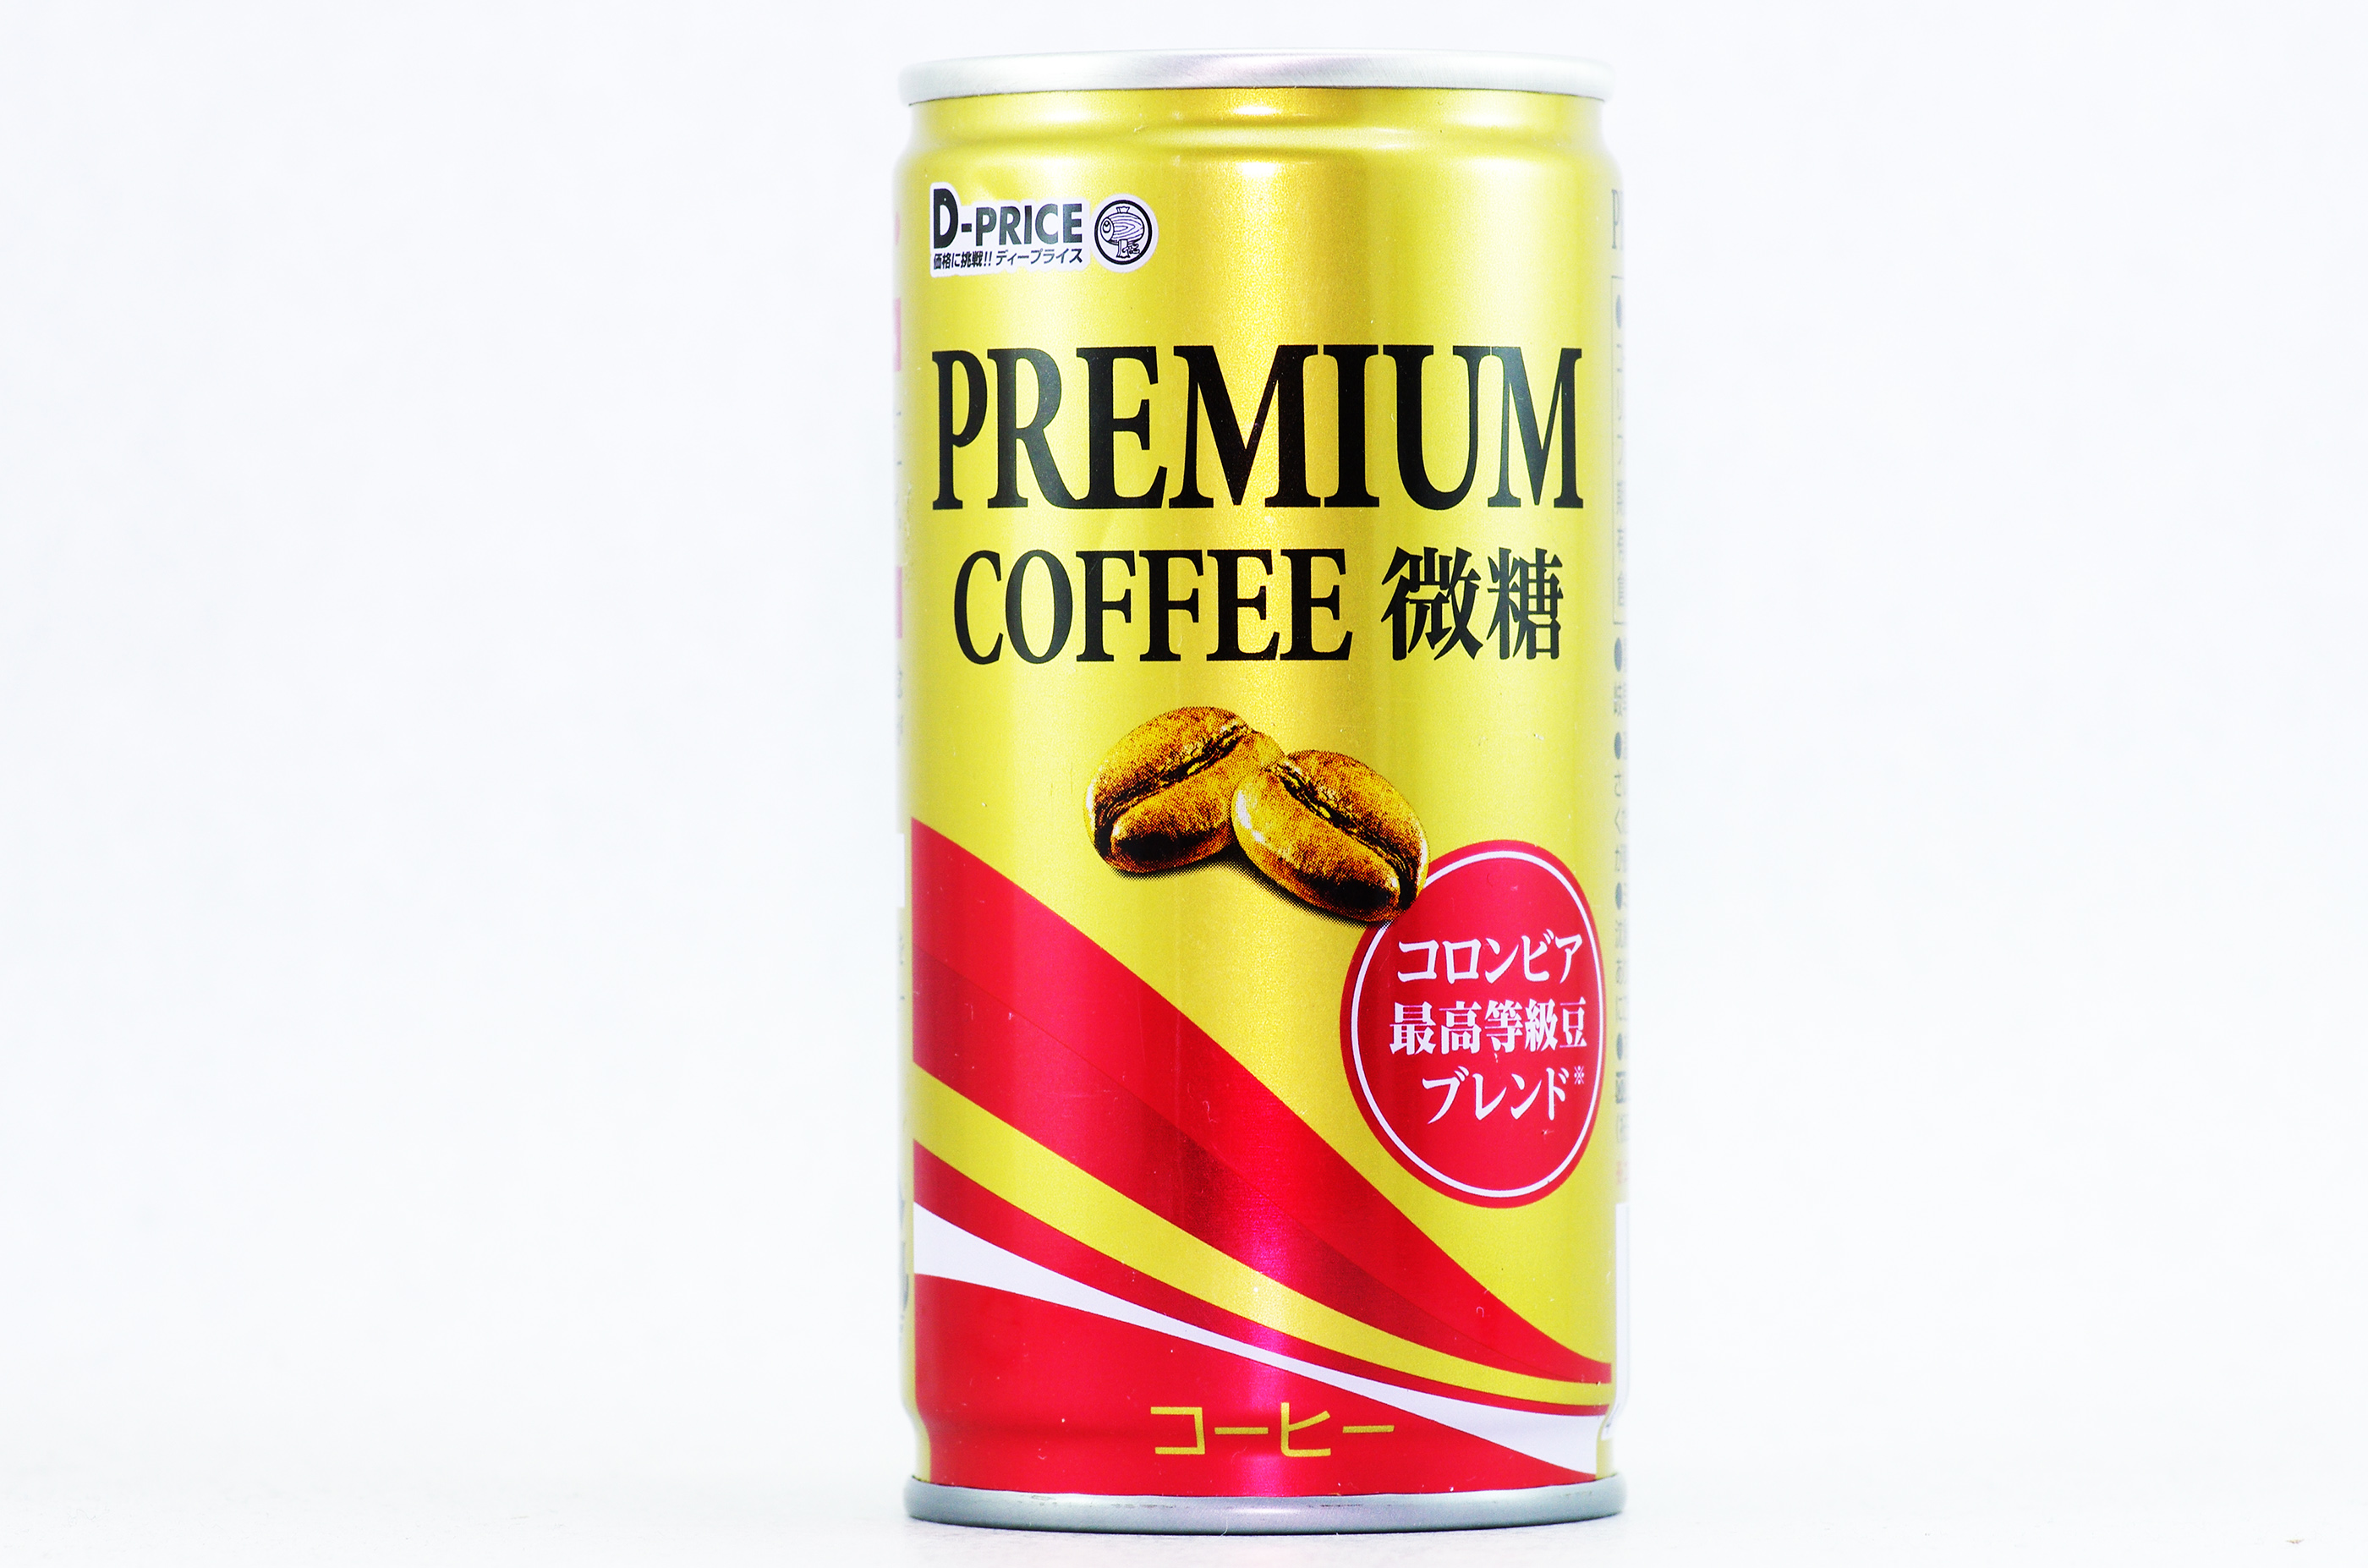 D-PRICE プレミアムコーヒー 微糖 2018年11月